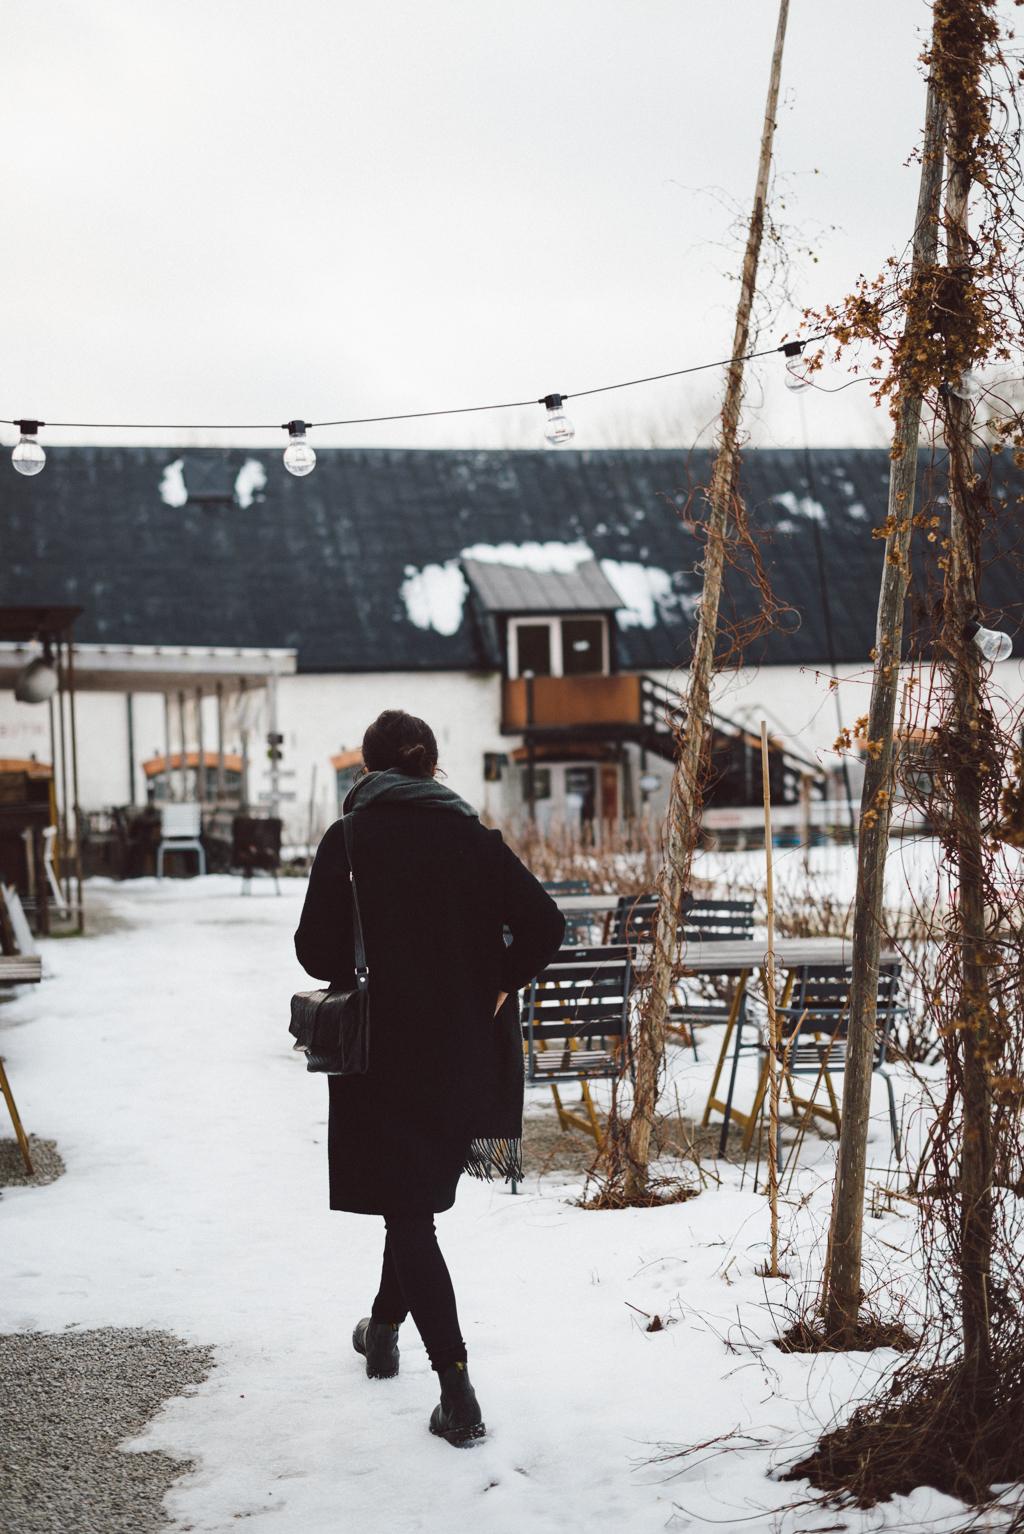 Babes_in_Boyland_Gotland_Foto_Matilda-Hildingsson_Stylist_Nathalie-Myrberg-26